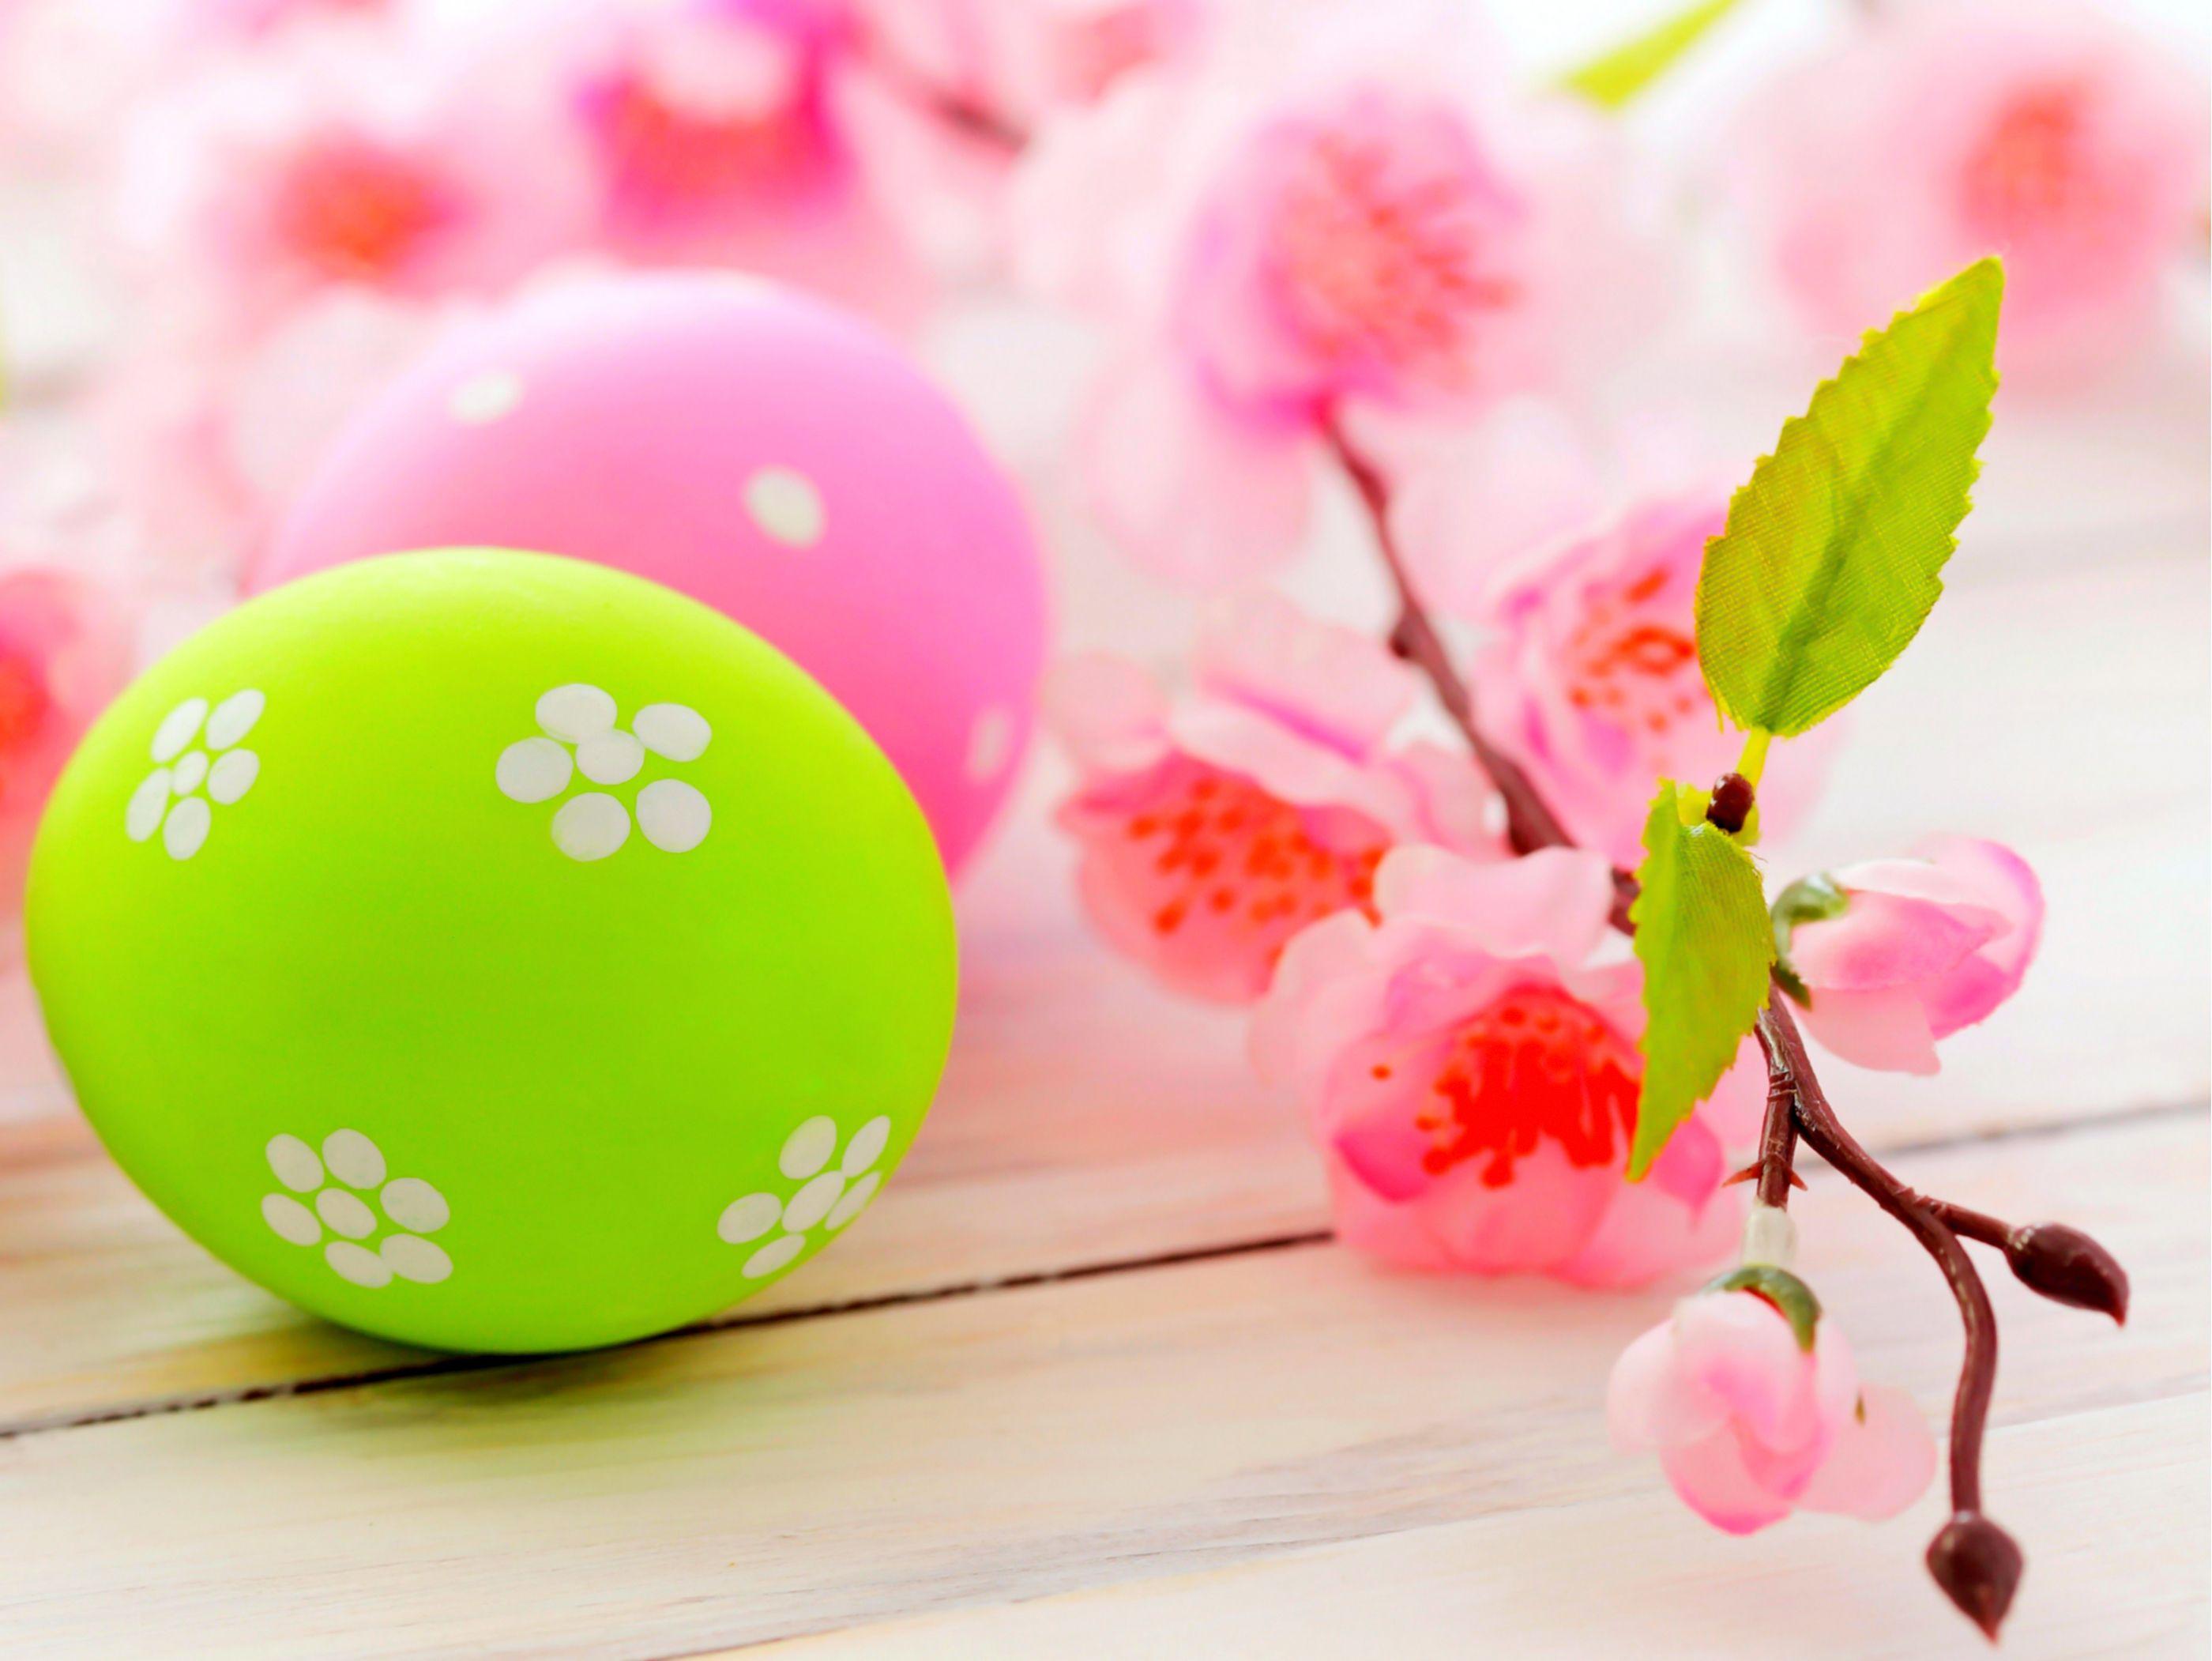 Happy Easter Desktop Background Wallpaper Free